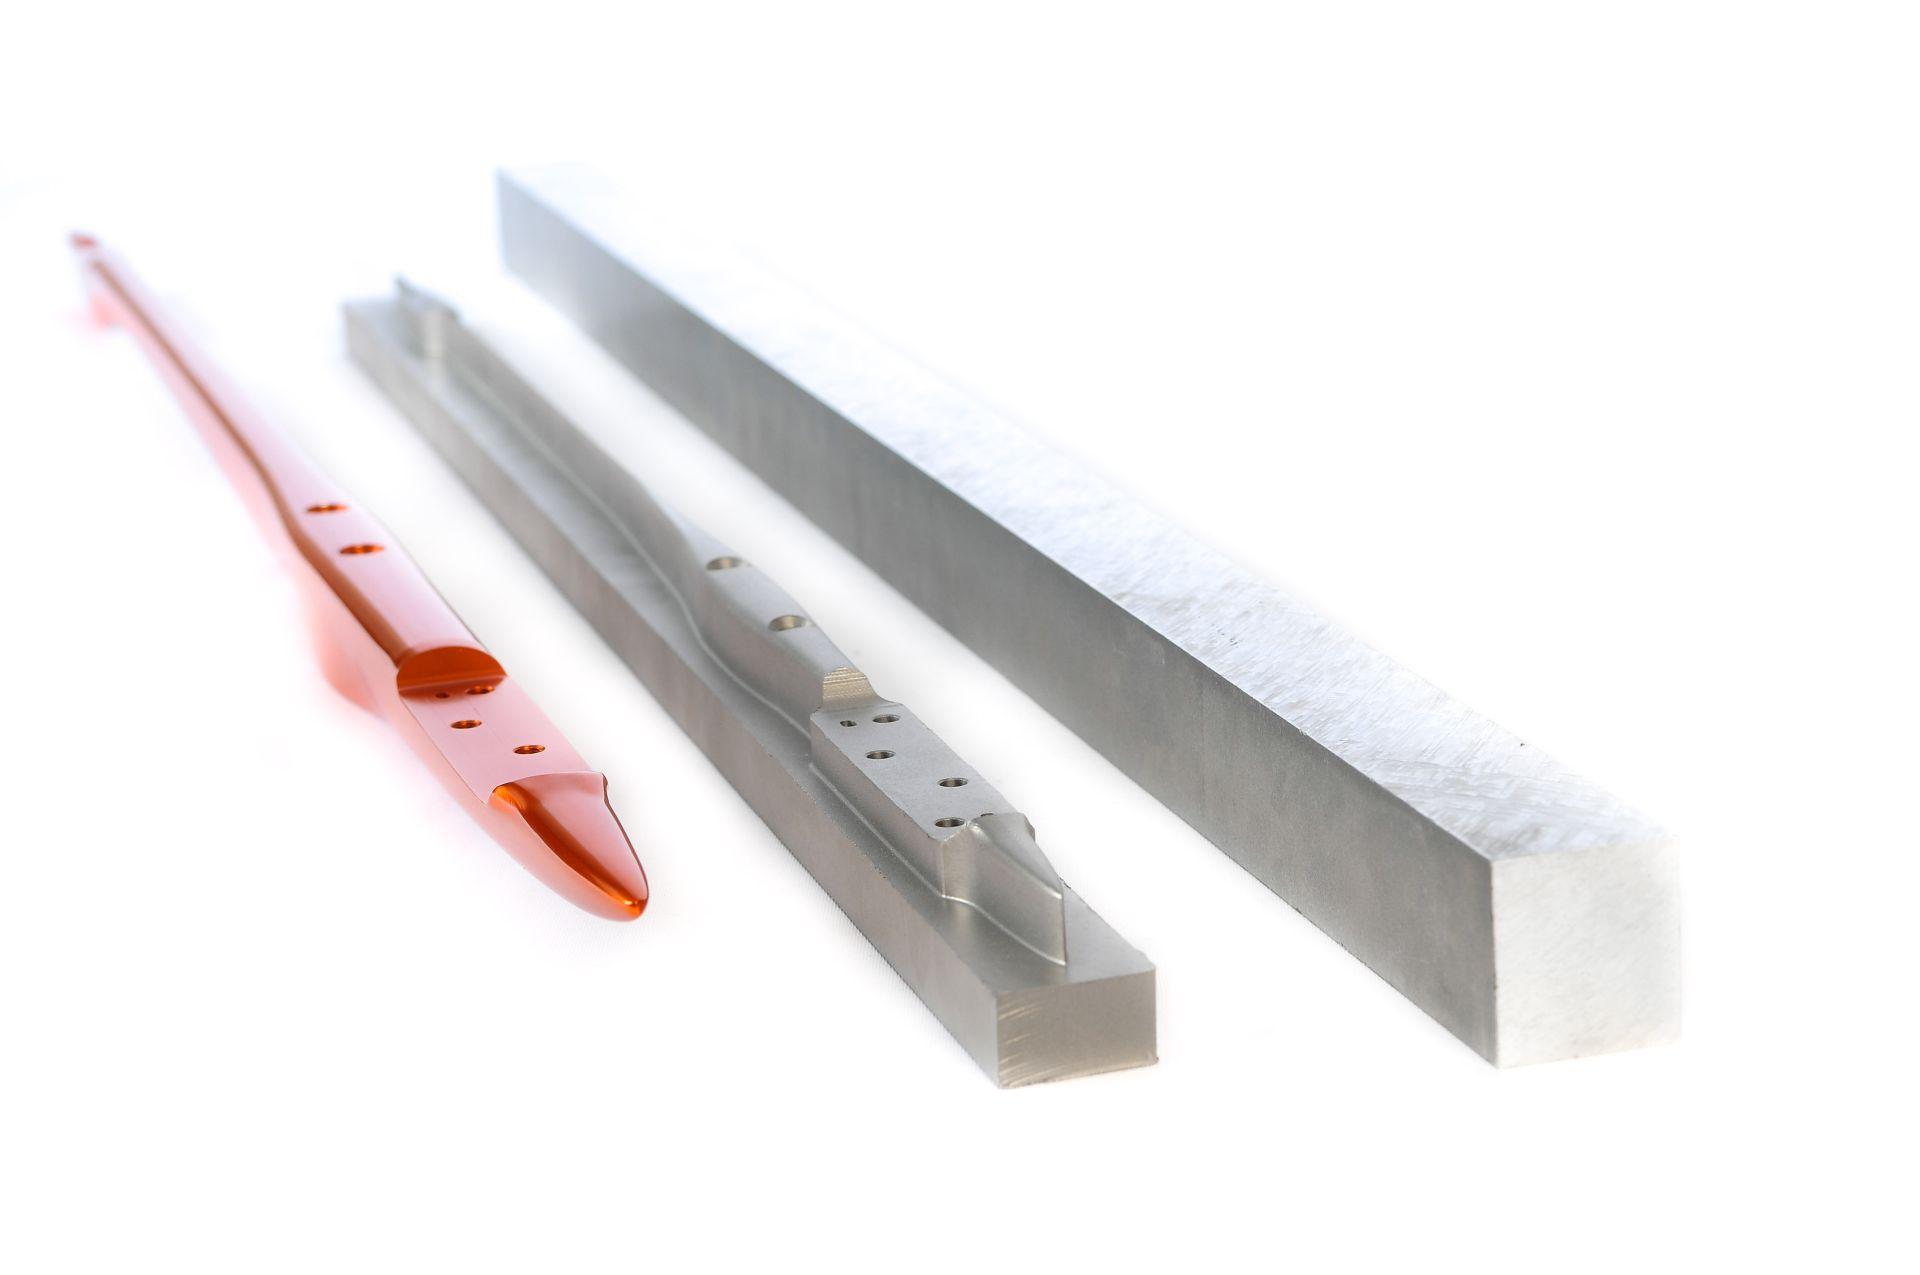 Kitefoil carbon aluminium alpinefoil 5 0 access v2 2252 2